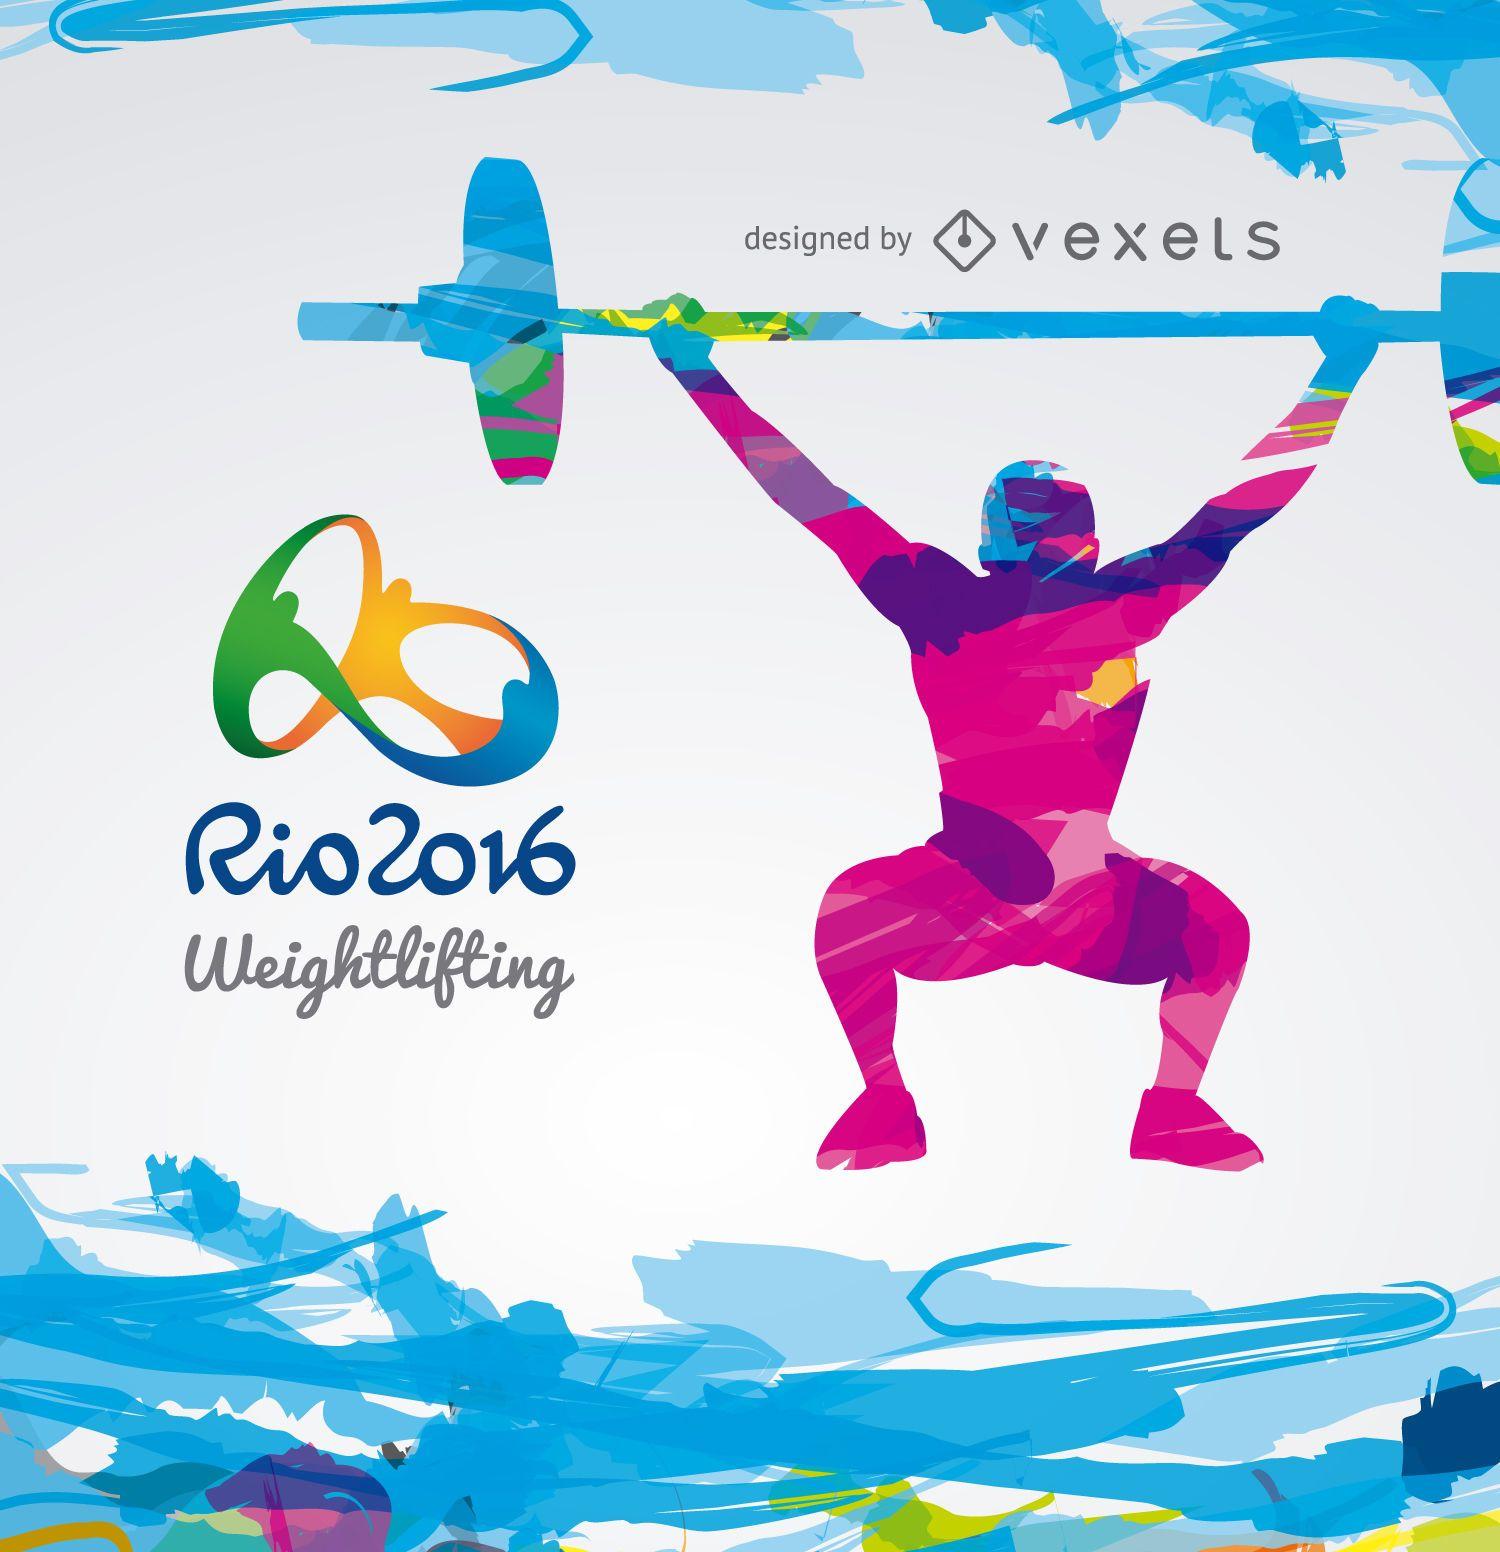 Olympics Rio 2016 - Weightlifting design